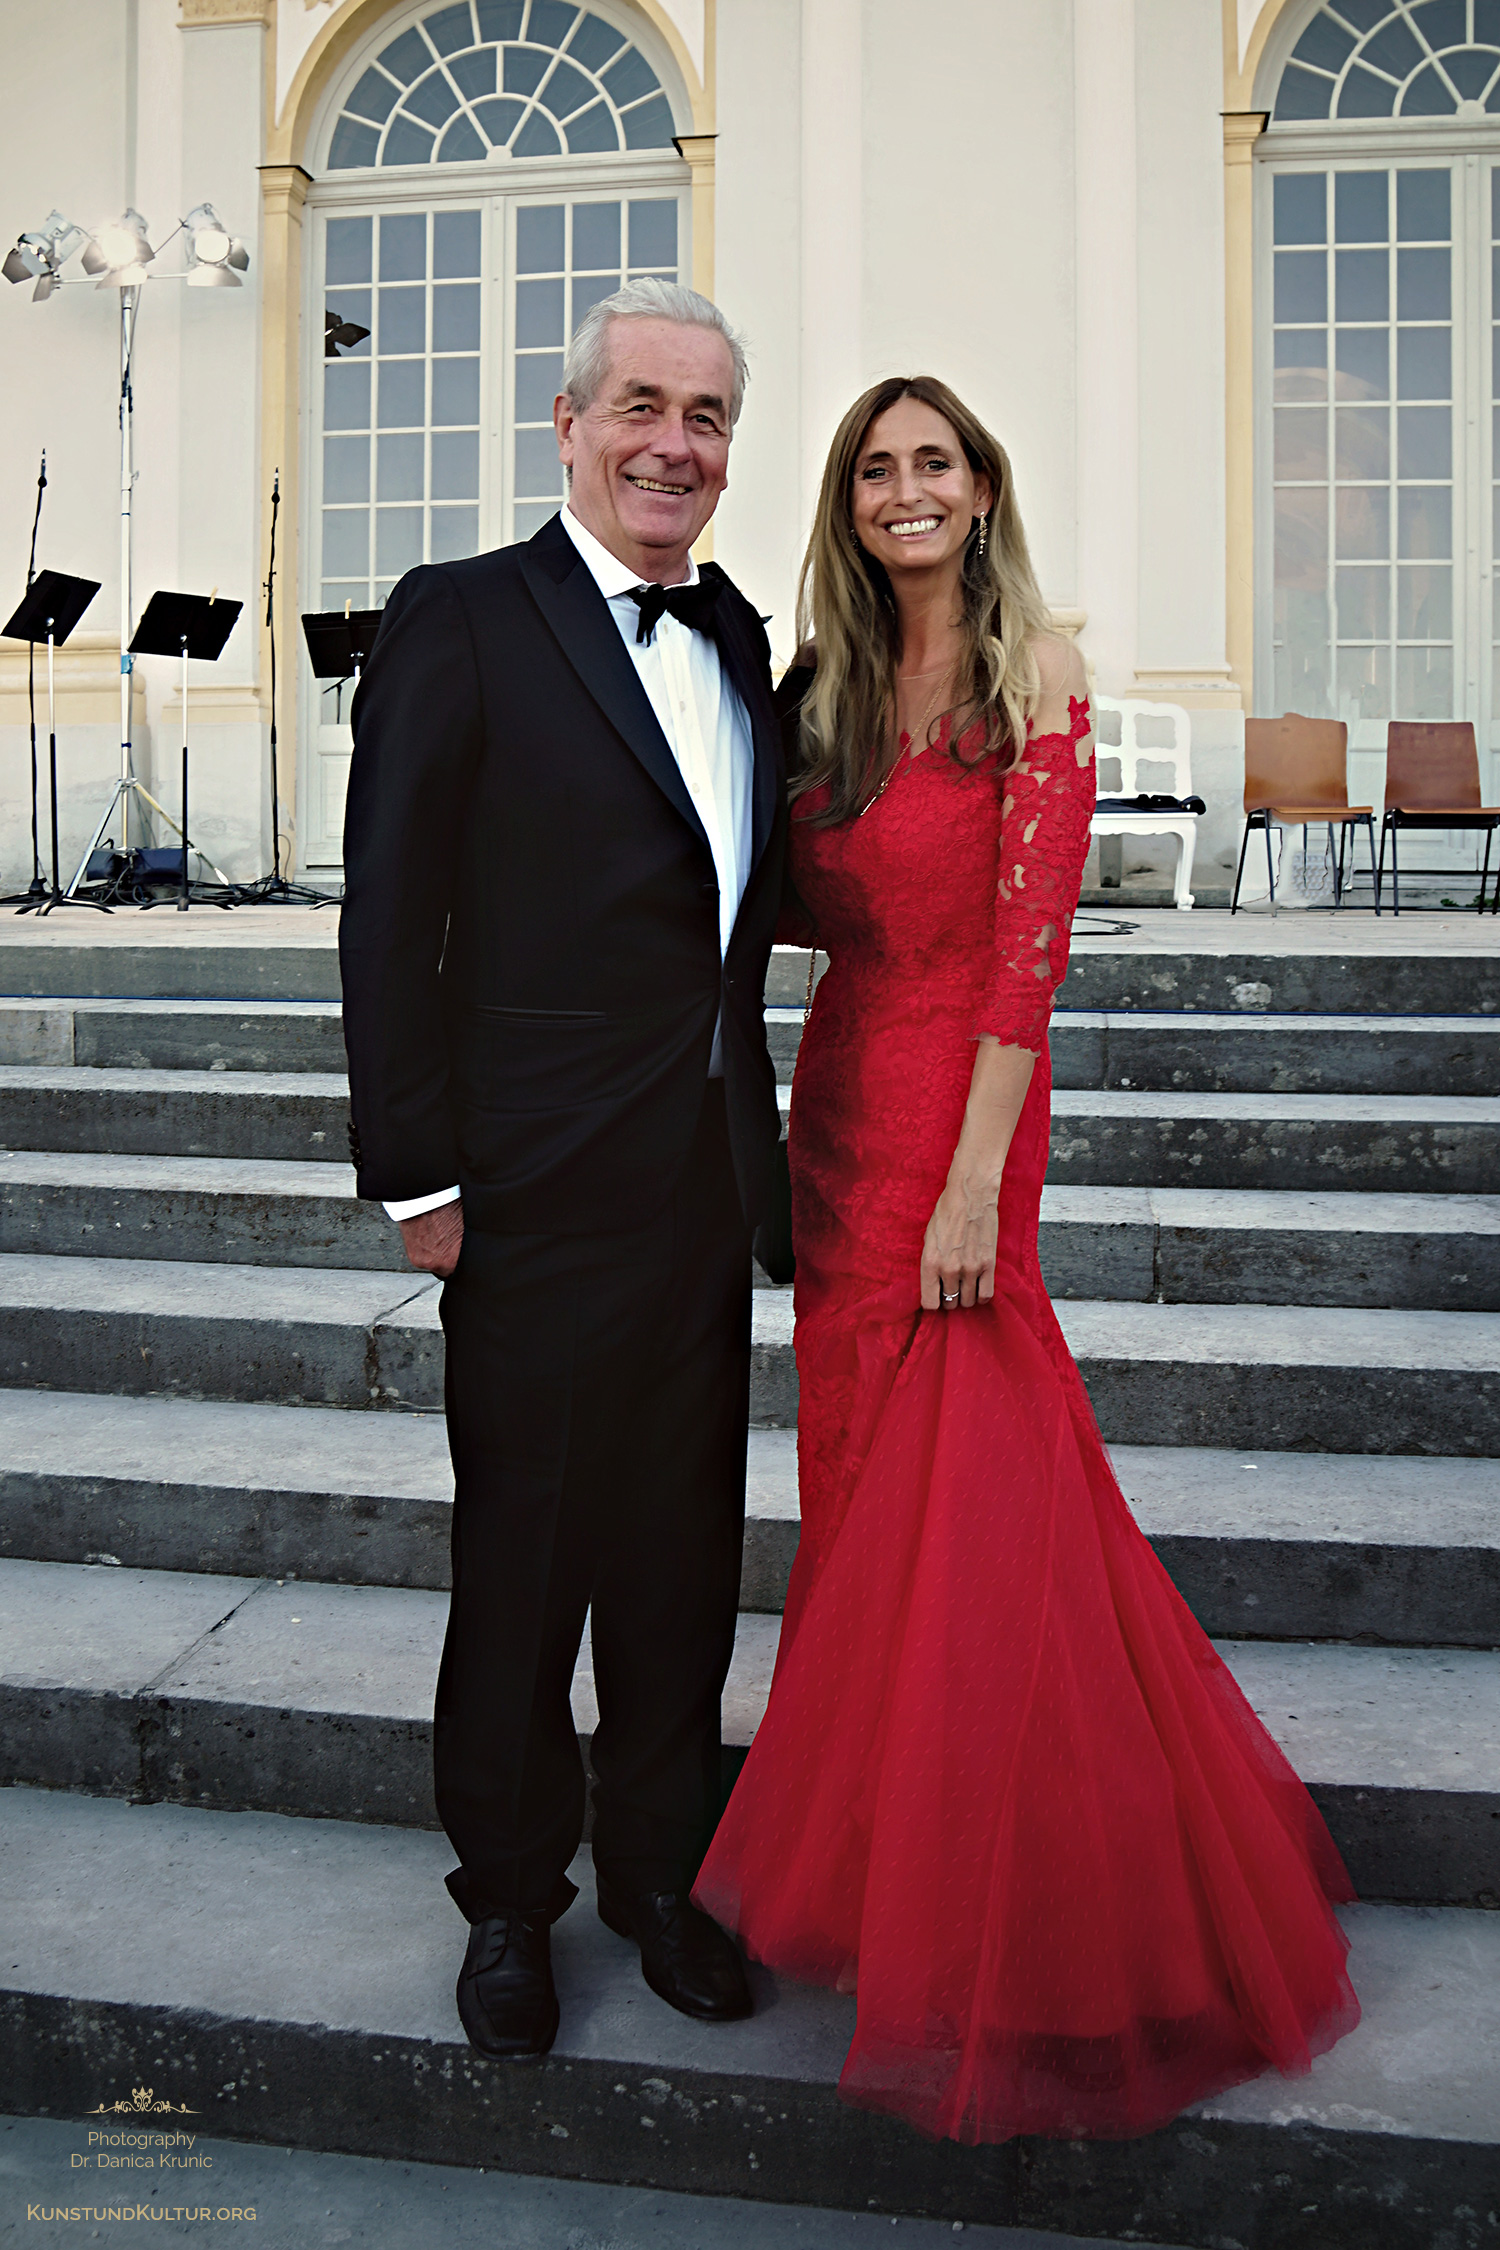 Honorarkonsul Dr. Horst Engler-Hamm und Dr. Danica Krunic